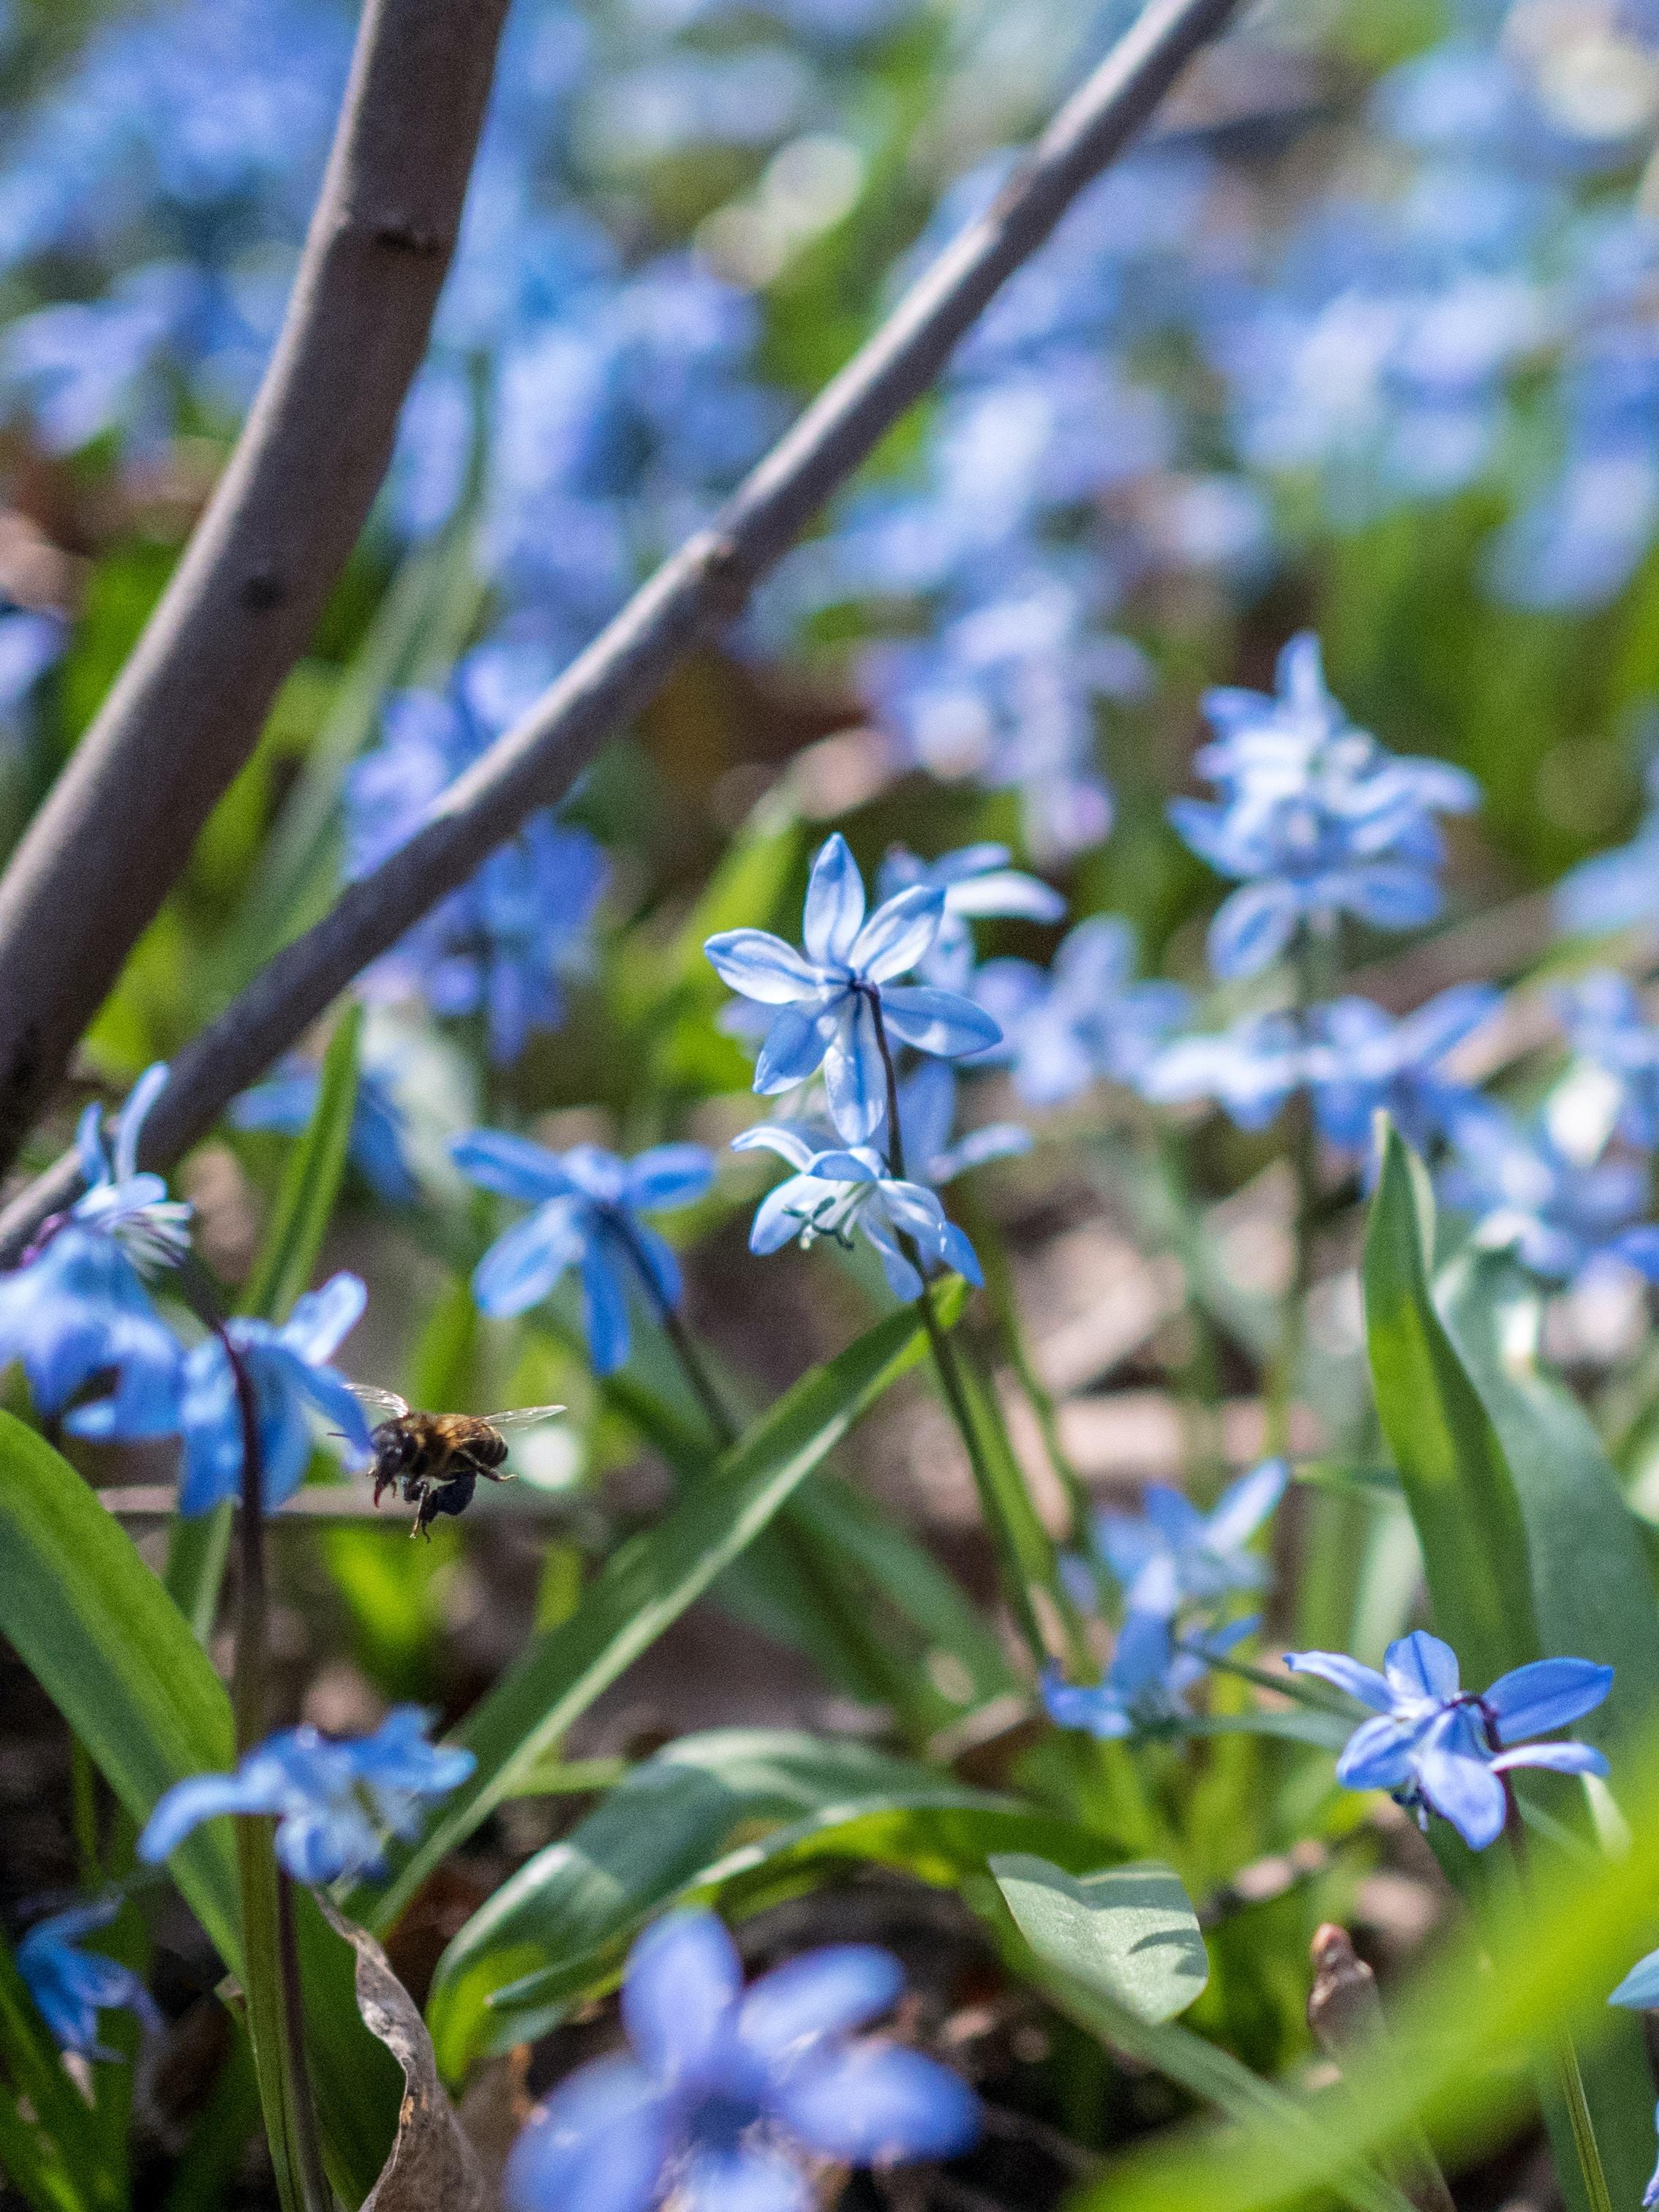 yellow bee flying beside blue flower